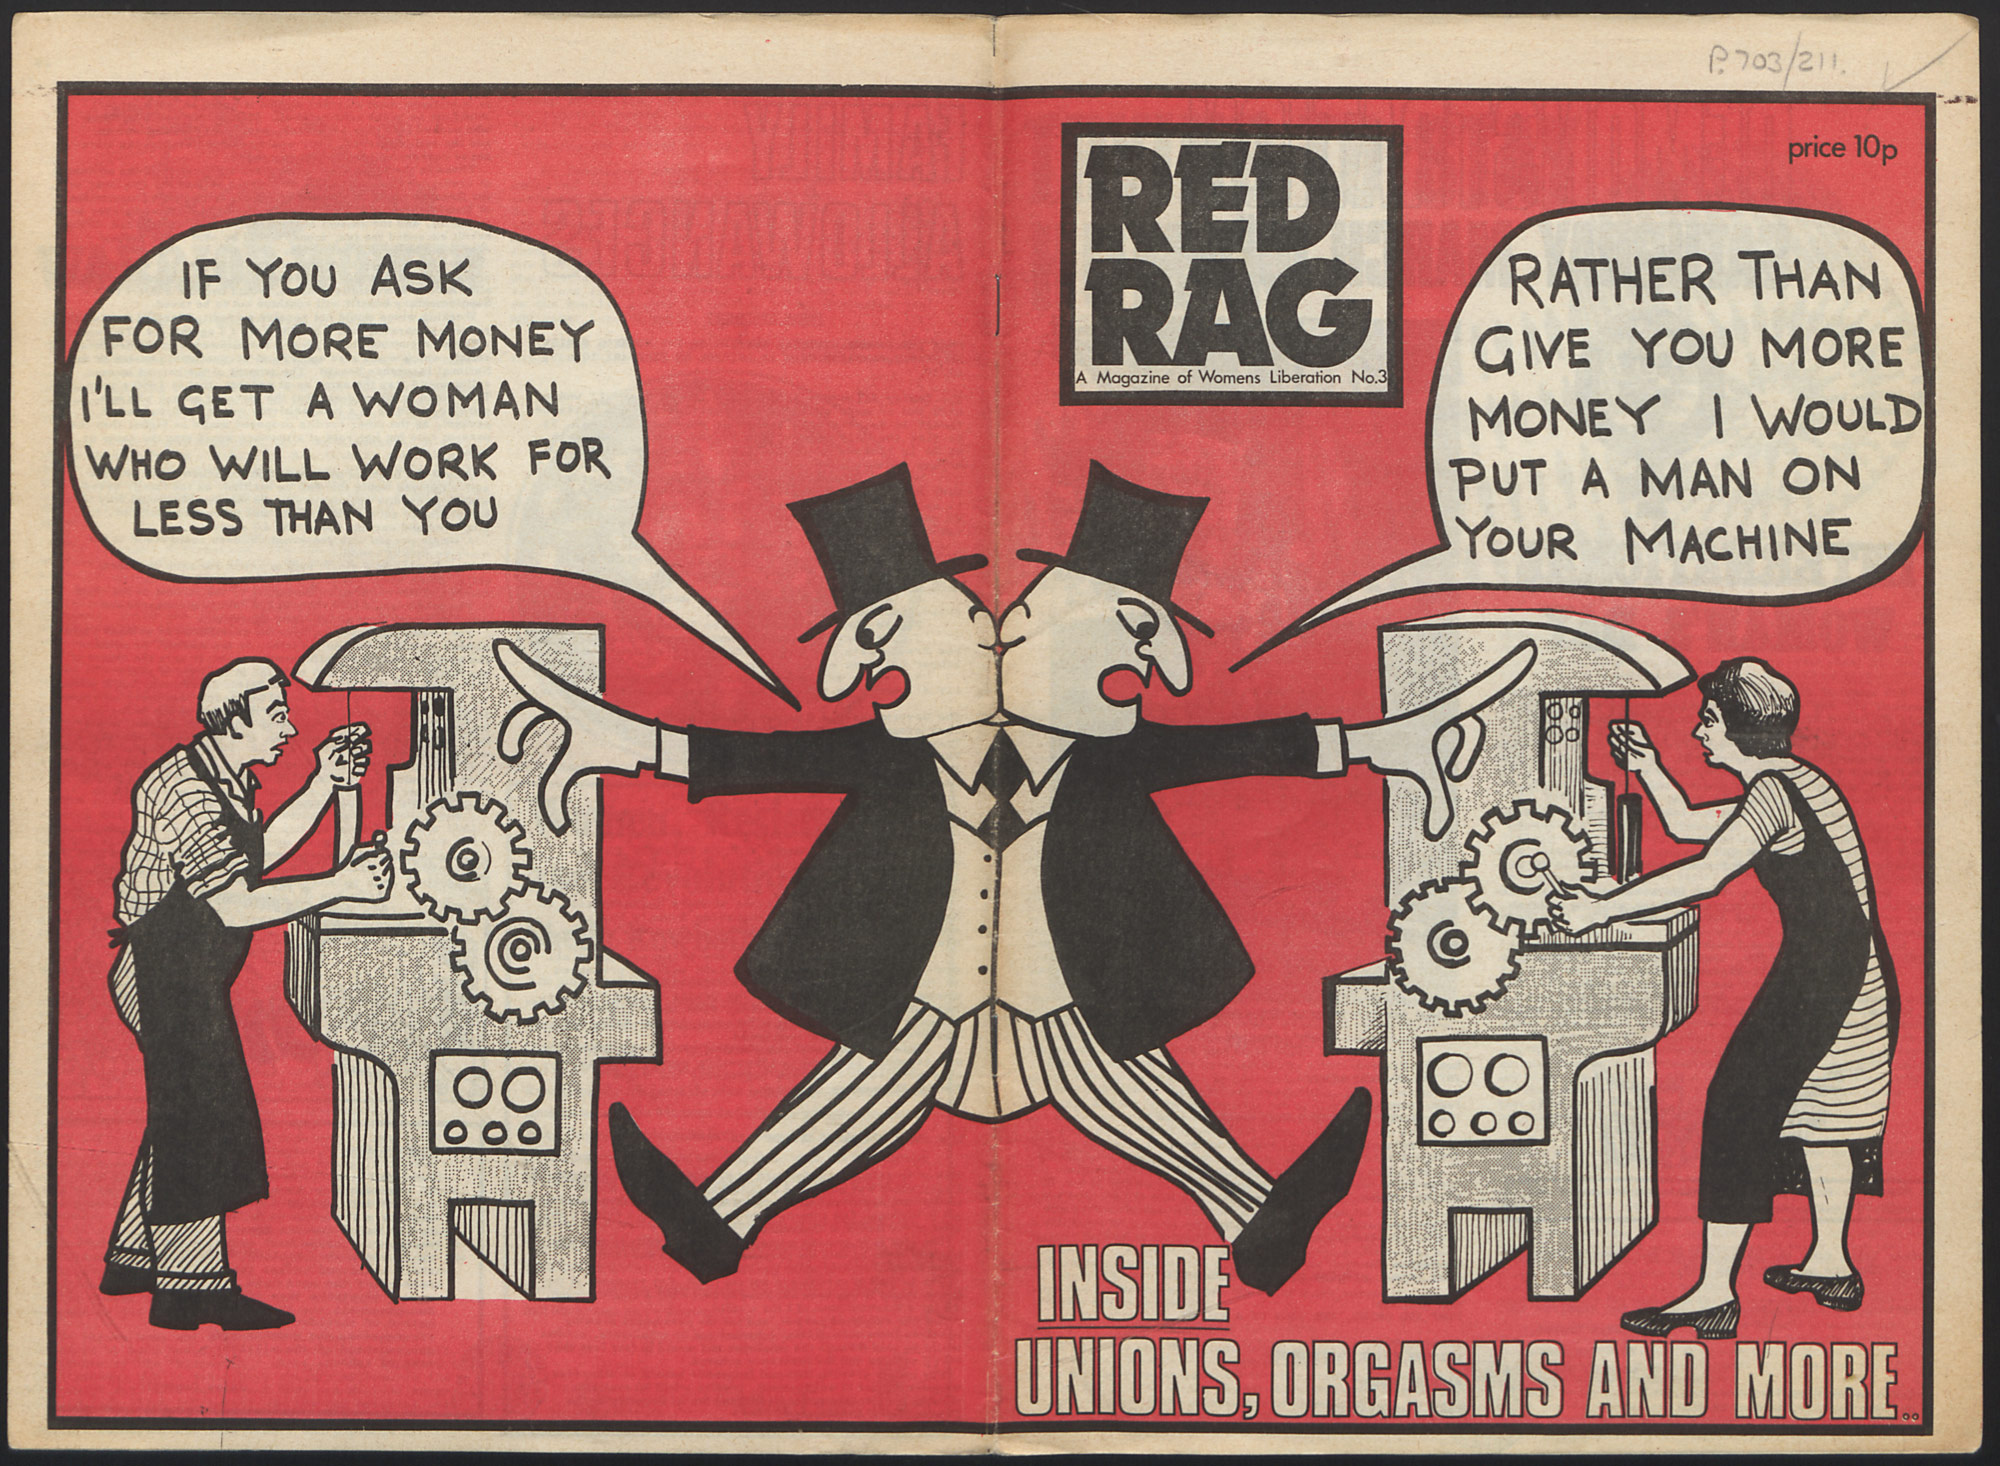 Red Rag magazine 1973